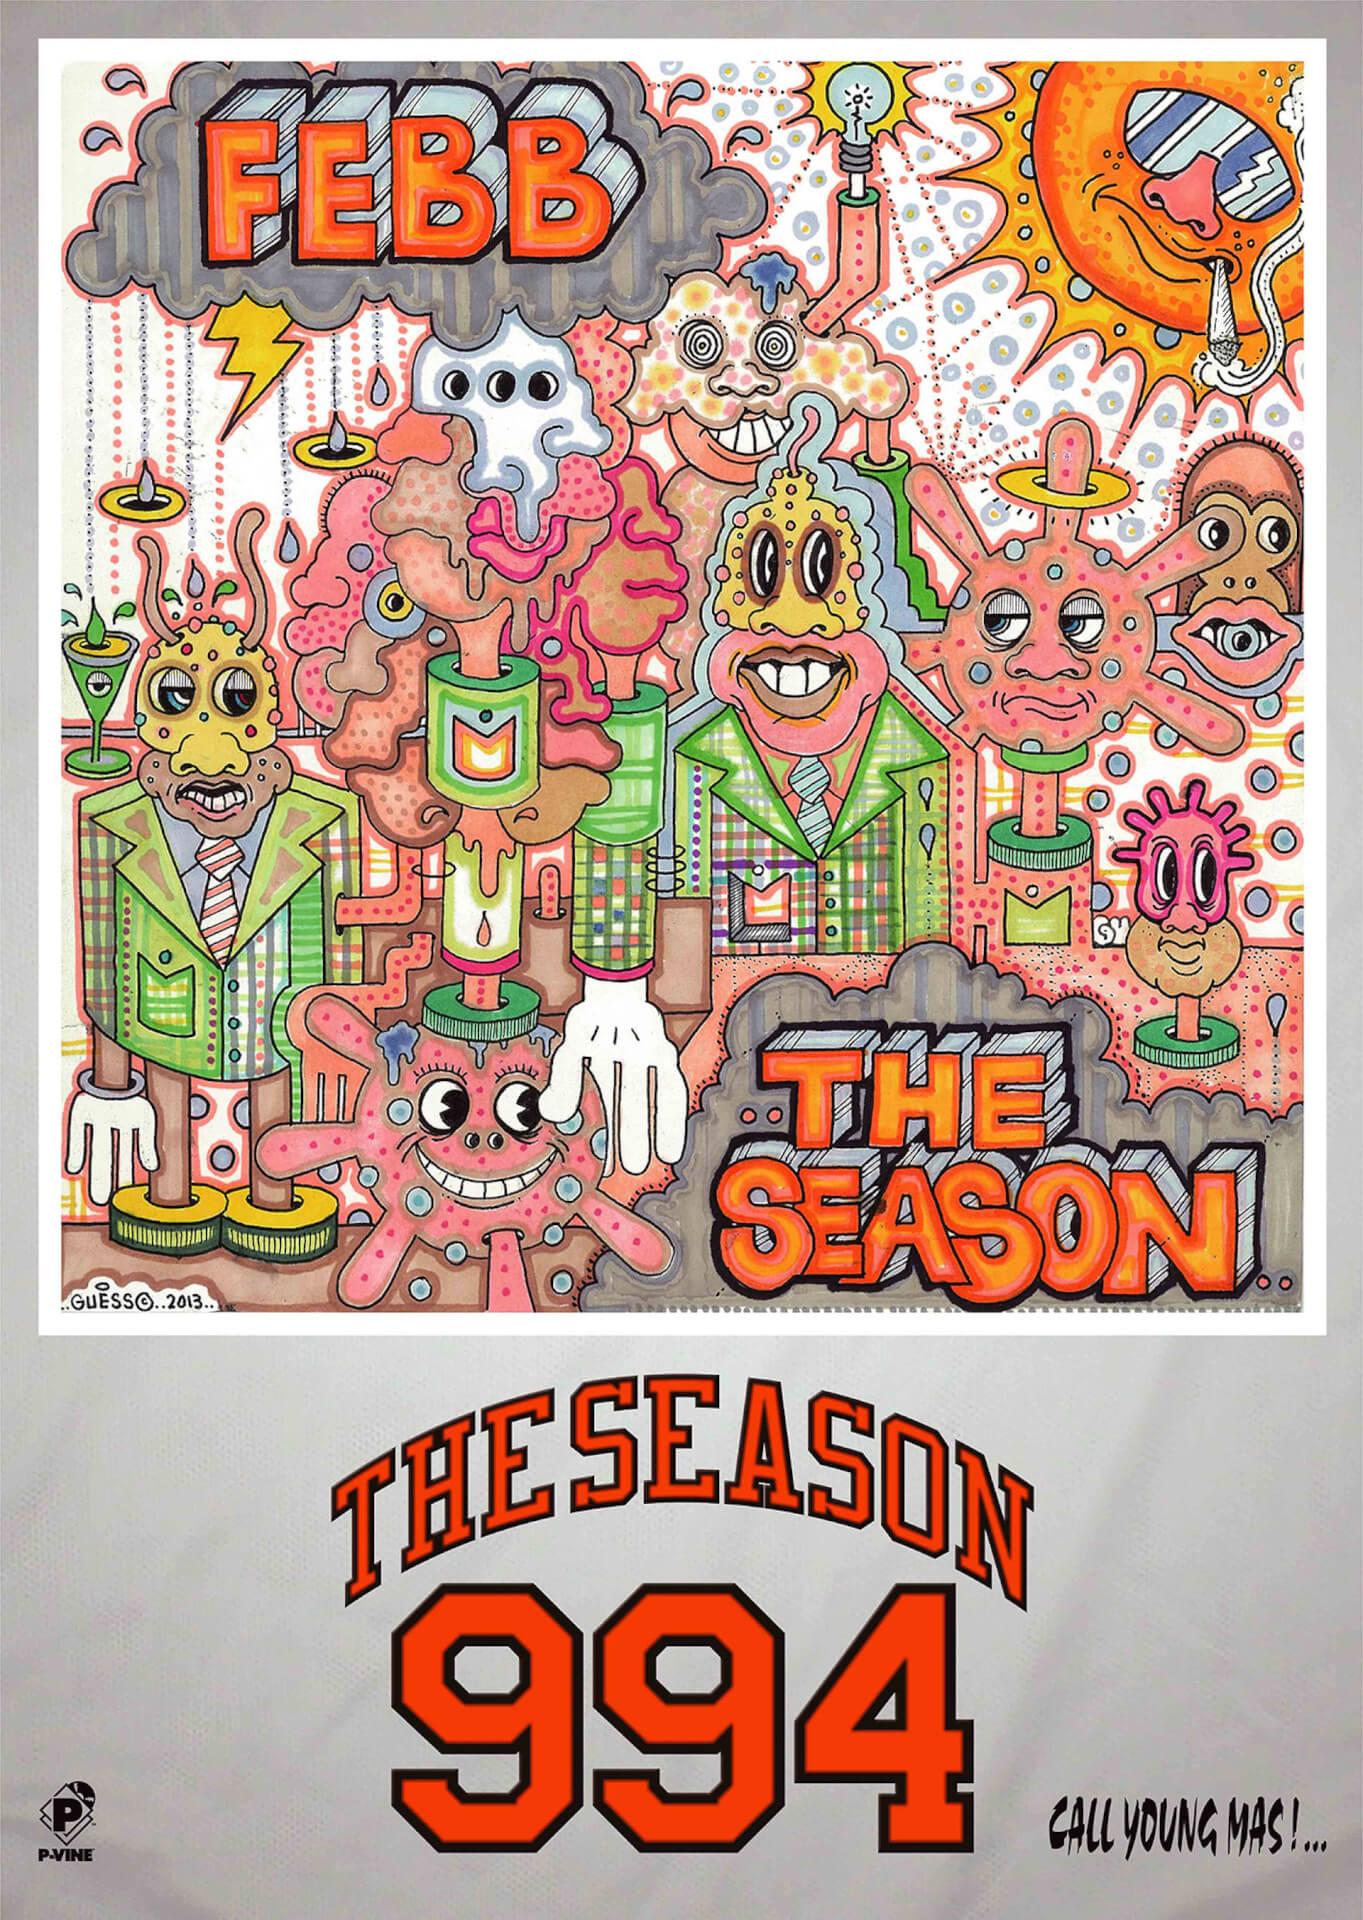 "FEBB AS YOUNG MASONの1stアルバム収録曲""THE TEST""の7インチ盤が完全限定プレスで発売決定!未発表曲もカップリング music210721_febb_7ep_2"